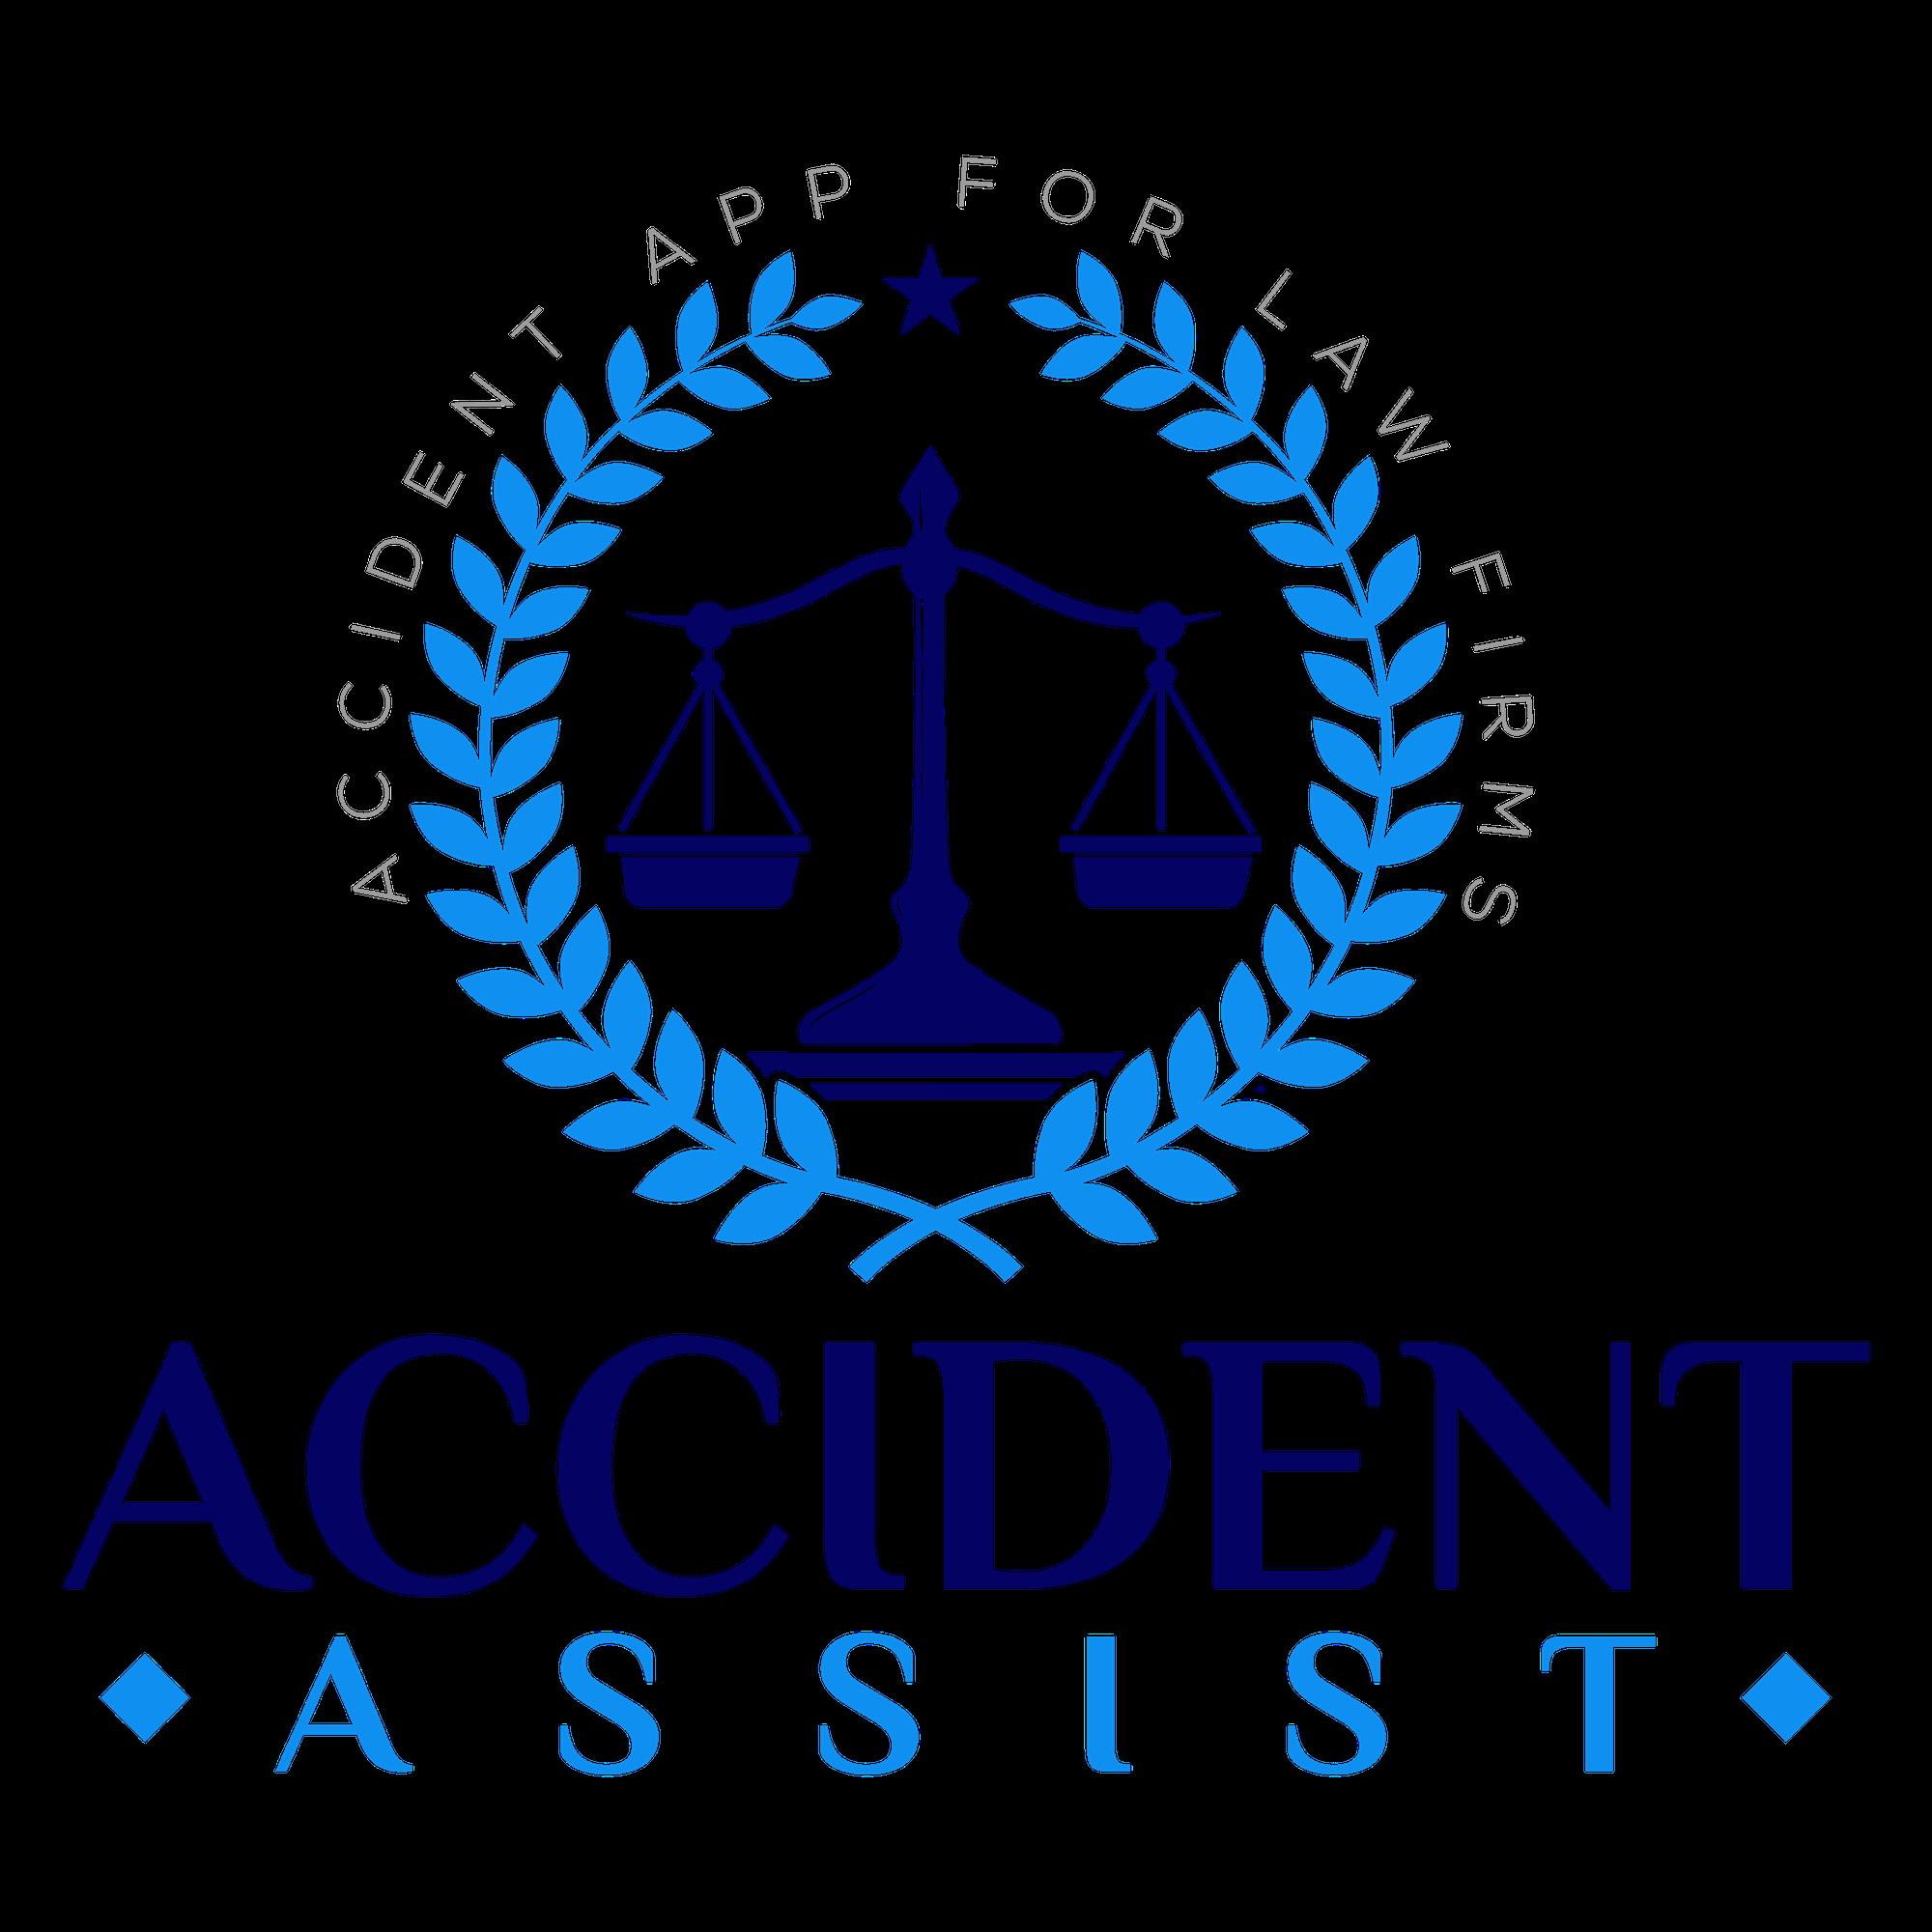 Accident Assist App Demo